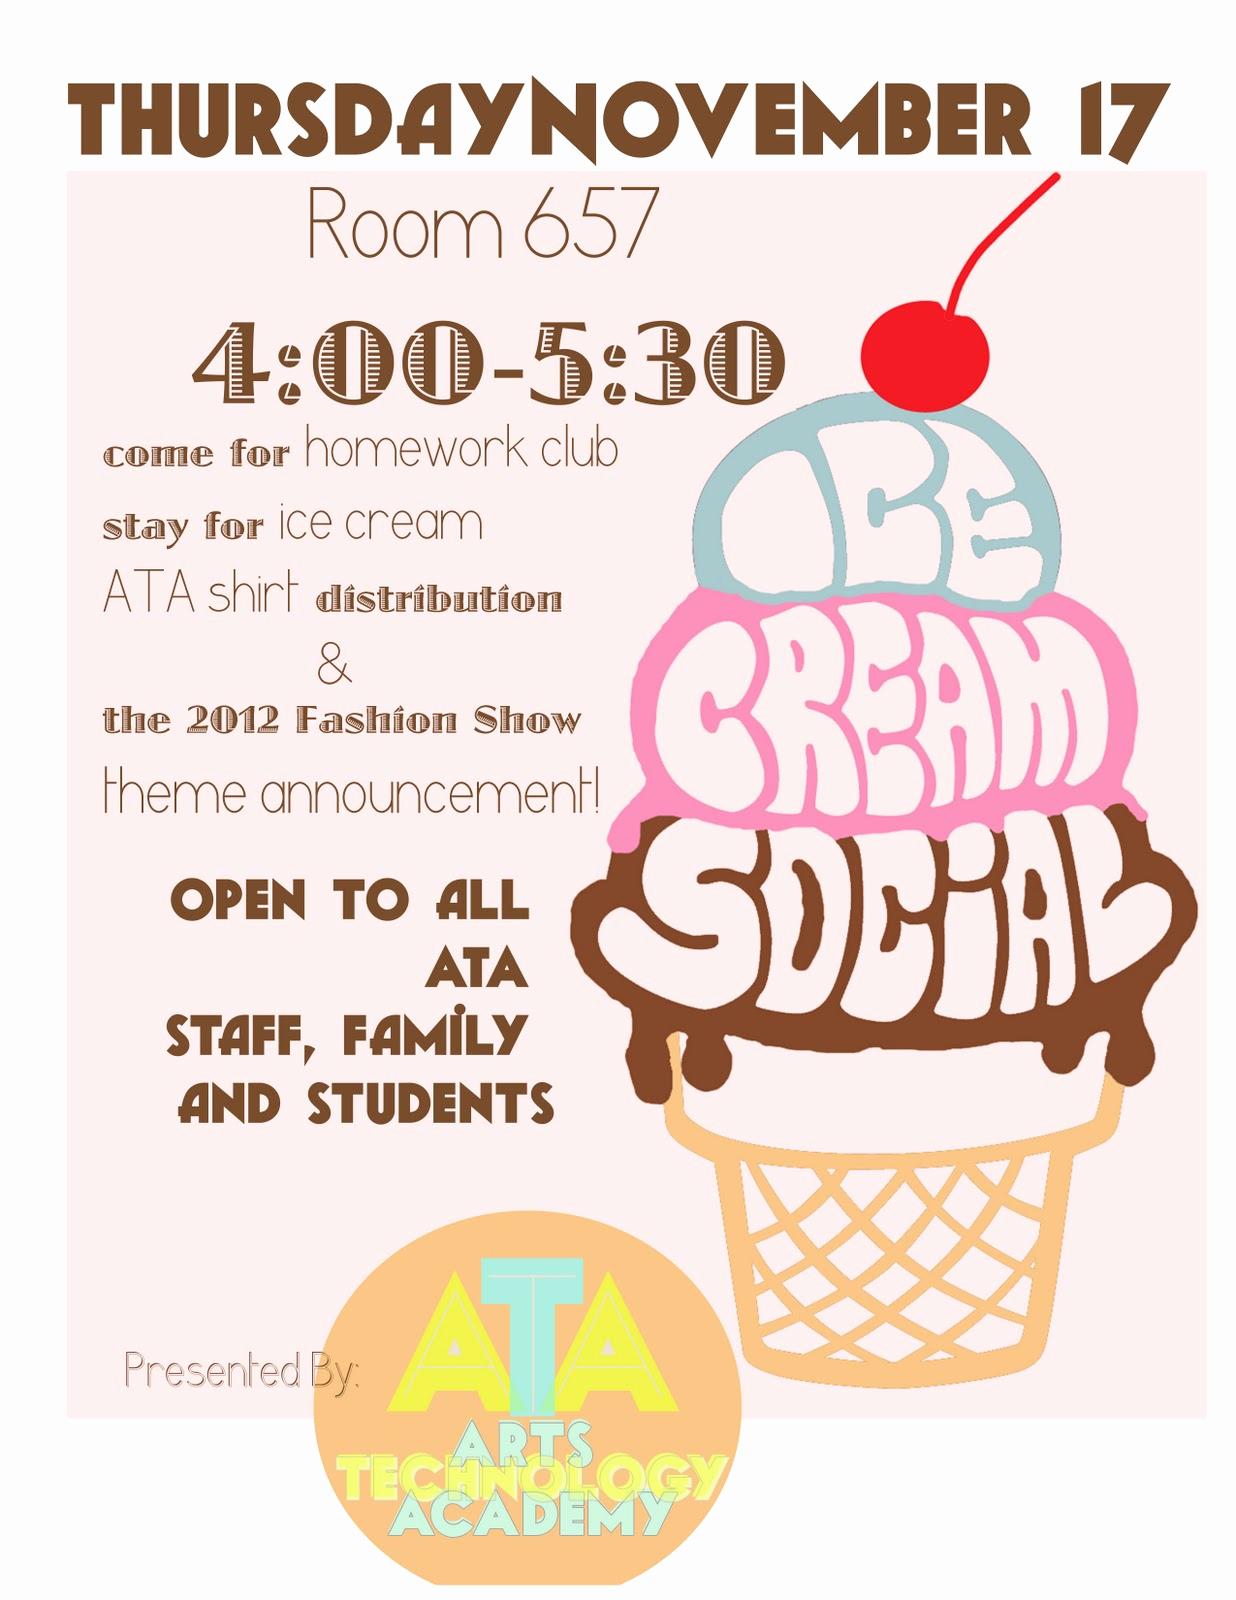 Ice Cream social Flyer Elegant Free Ice Cream social Invites